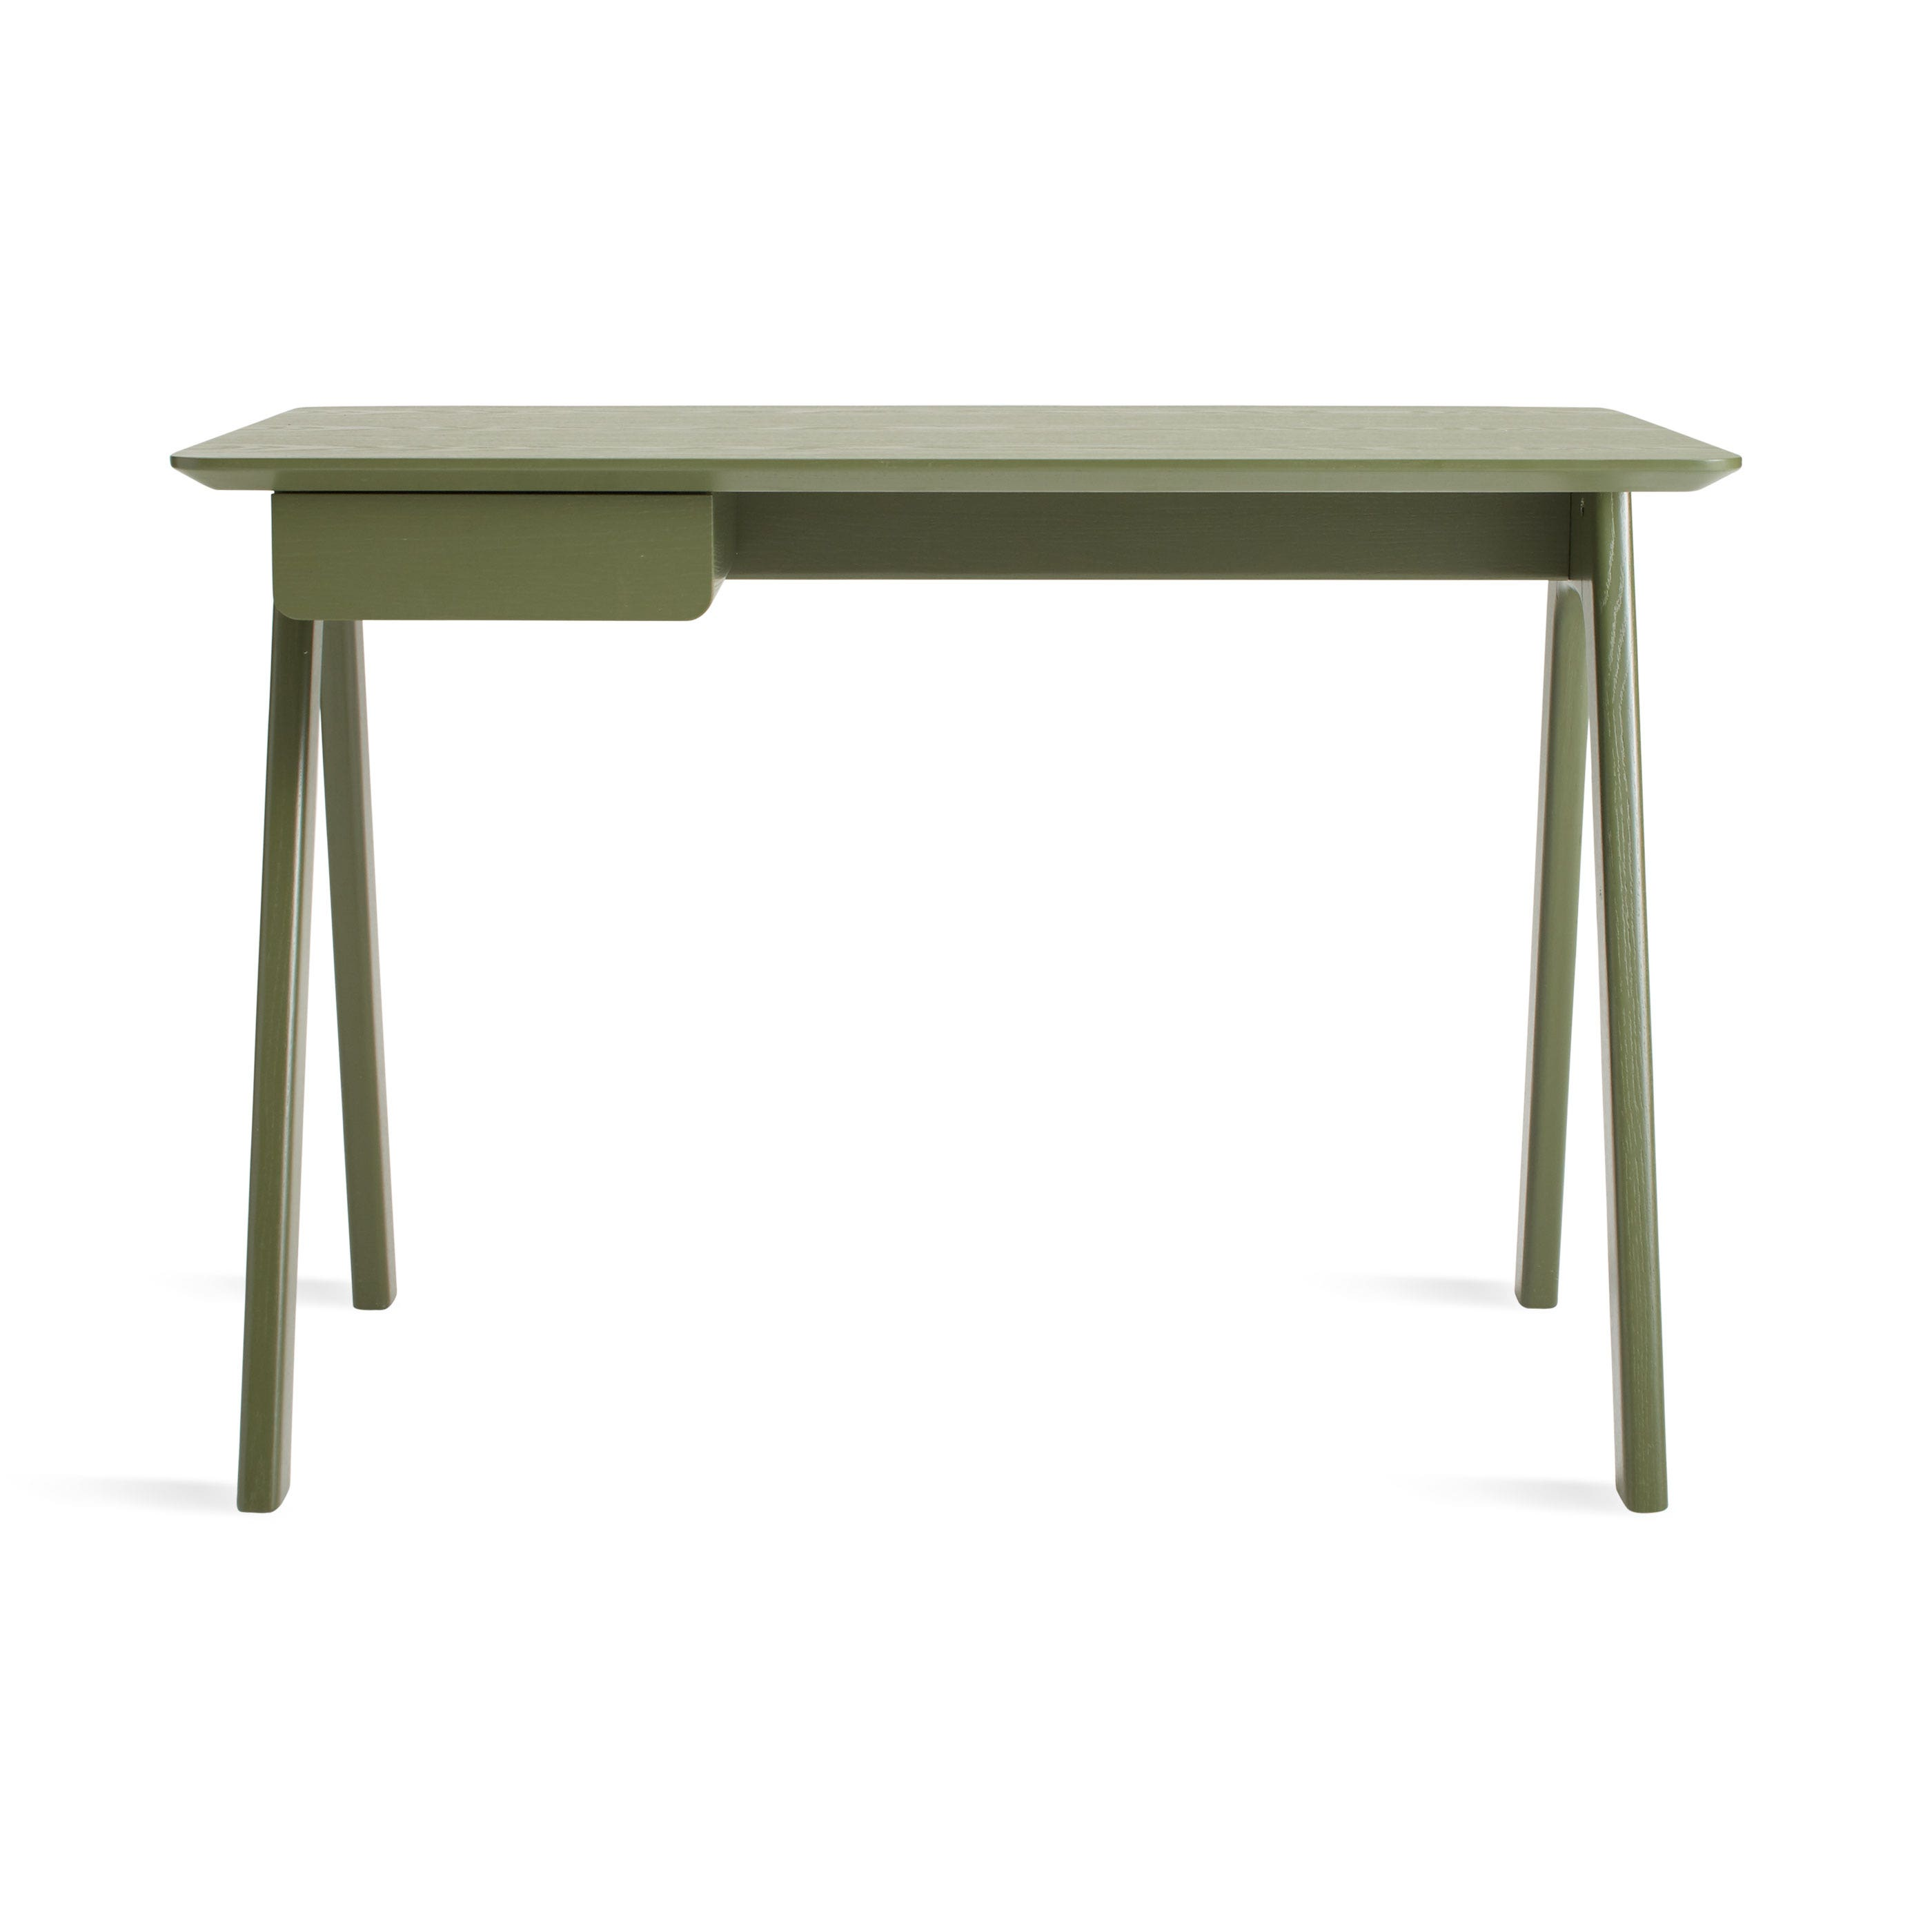 Stash Writing Desk Modern Writing Desk Blu Dot - Contemporary writing desk furniture